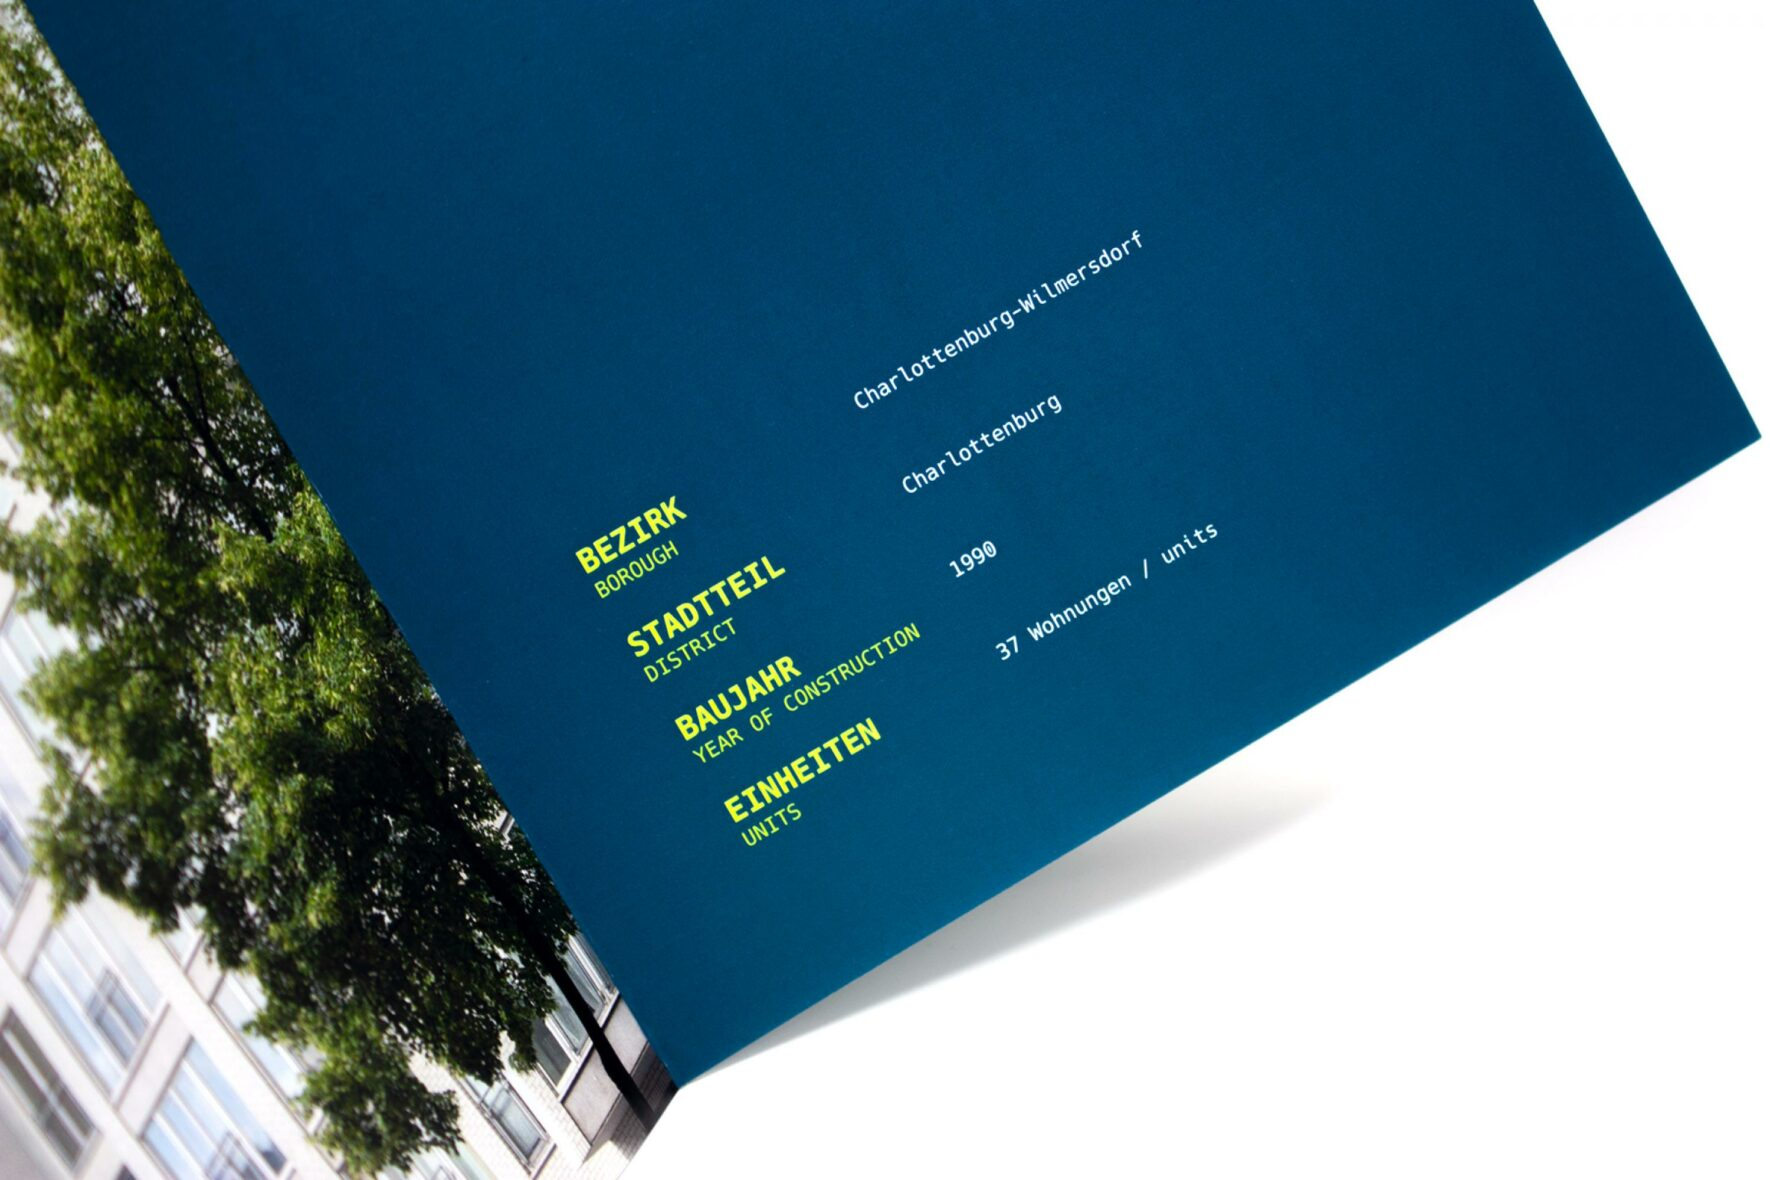 Broschuere-Leibniz-Immobilienbranding-Trendcity-FORMLOS-berlin-Print76